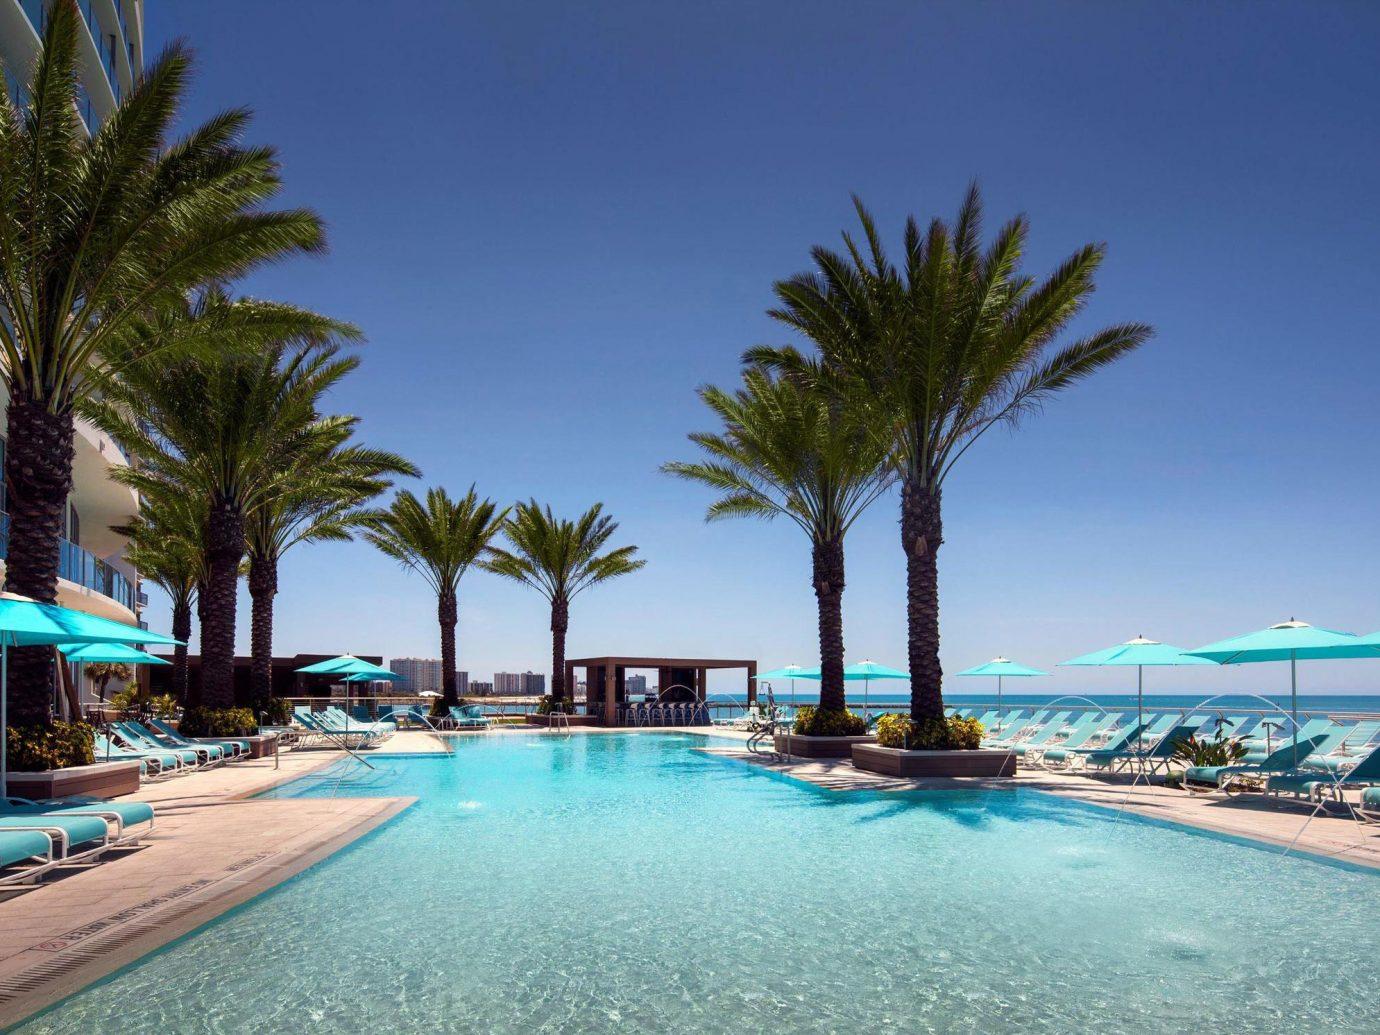 Hotels Secret Getaways Trip Ideas outdoor tree sky palm Beach swimming pool Resort vacation Sea caribbean Ocean arecales estate bay Lagoon Pool marina tropics blue lined shore colorful